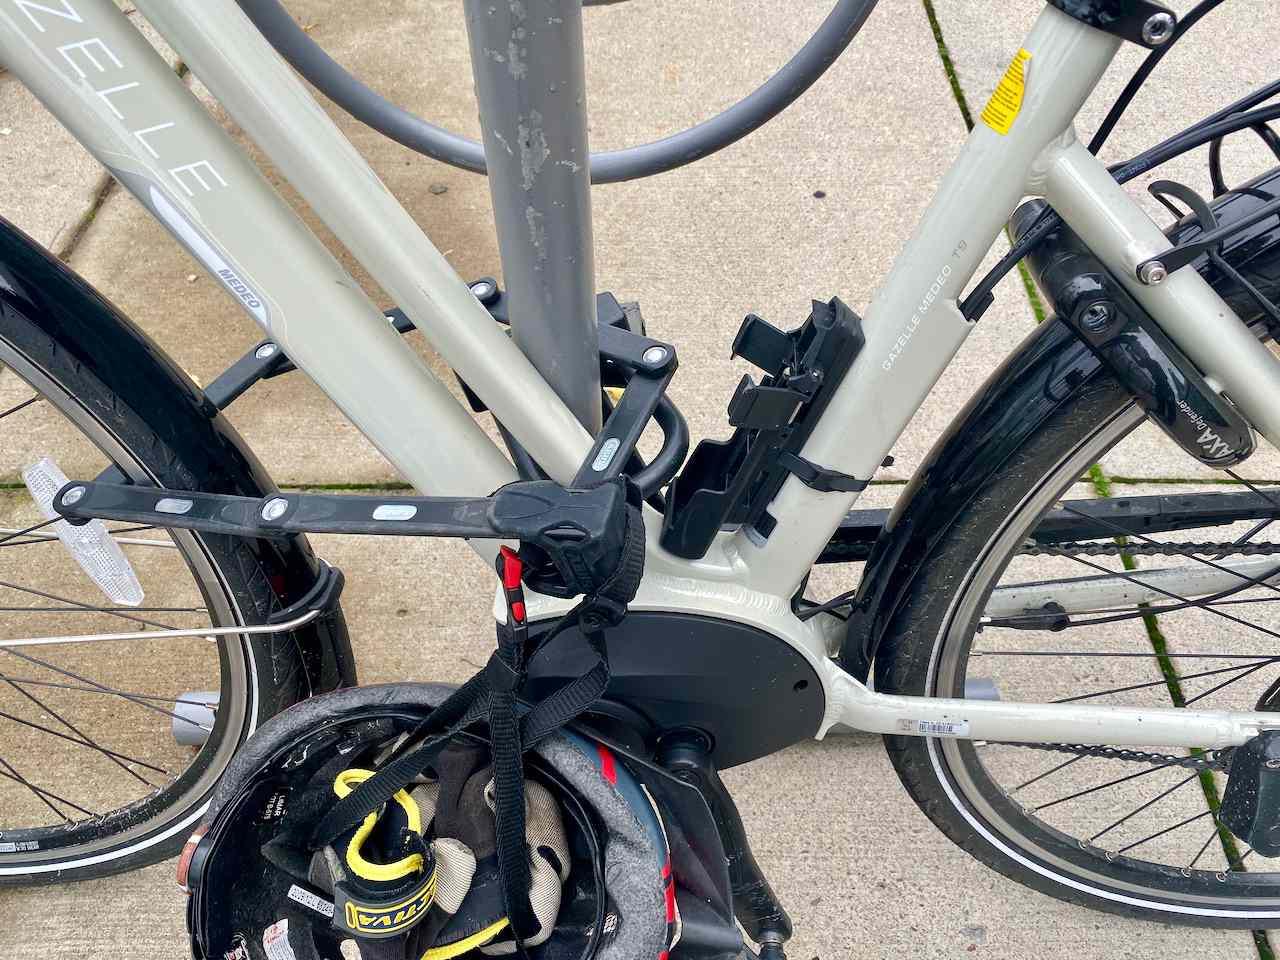 Three locks on my bike